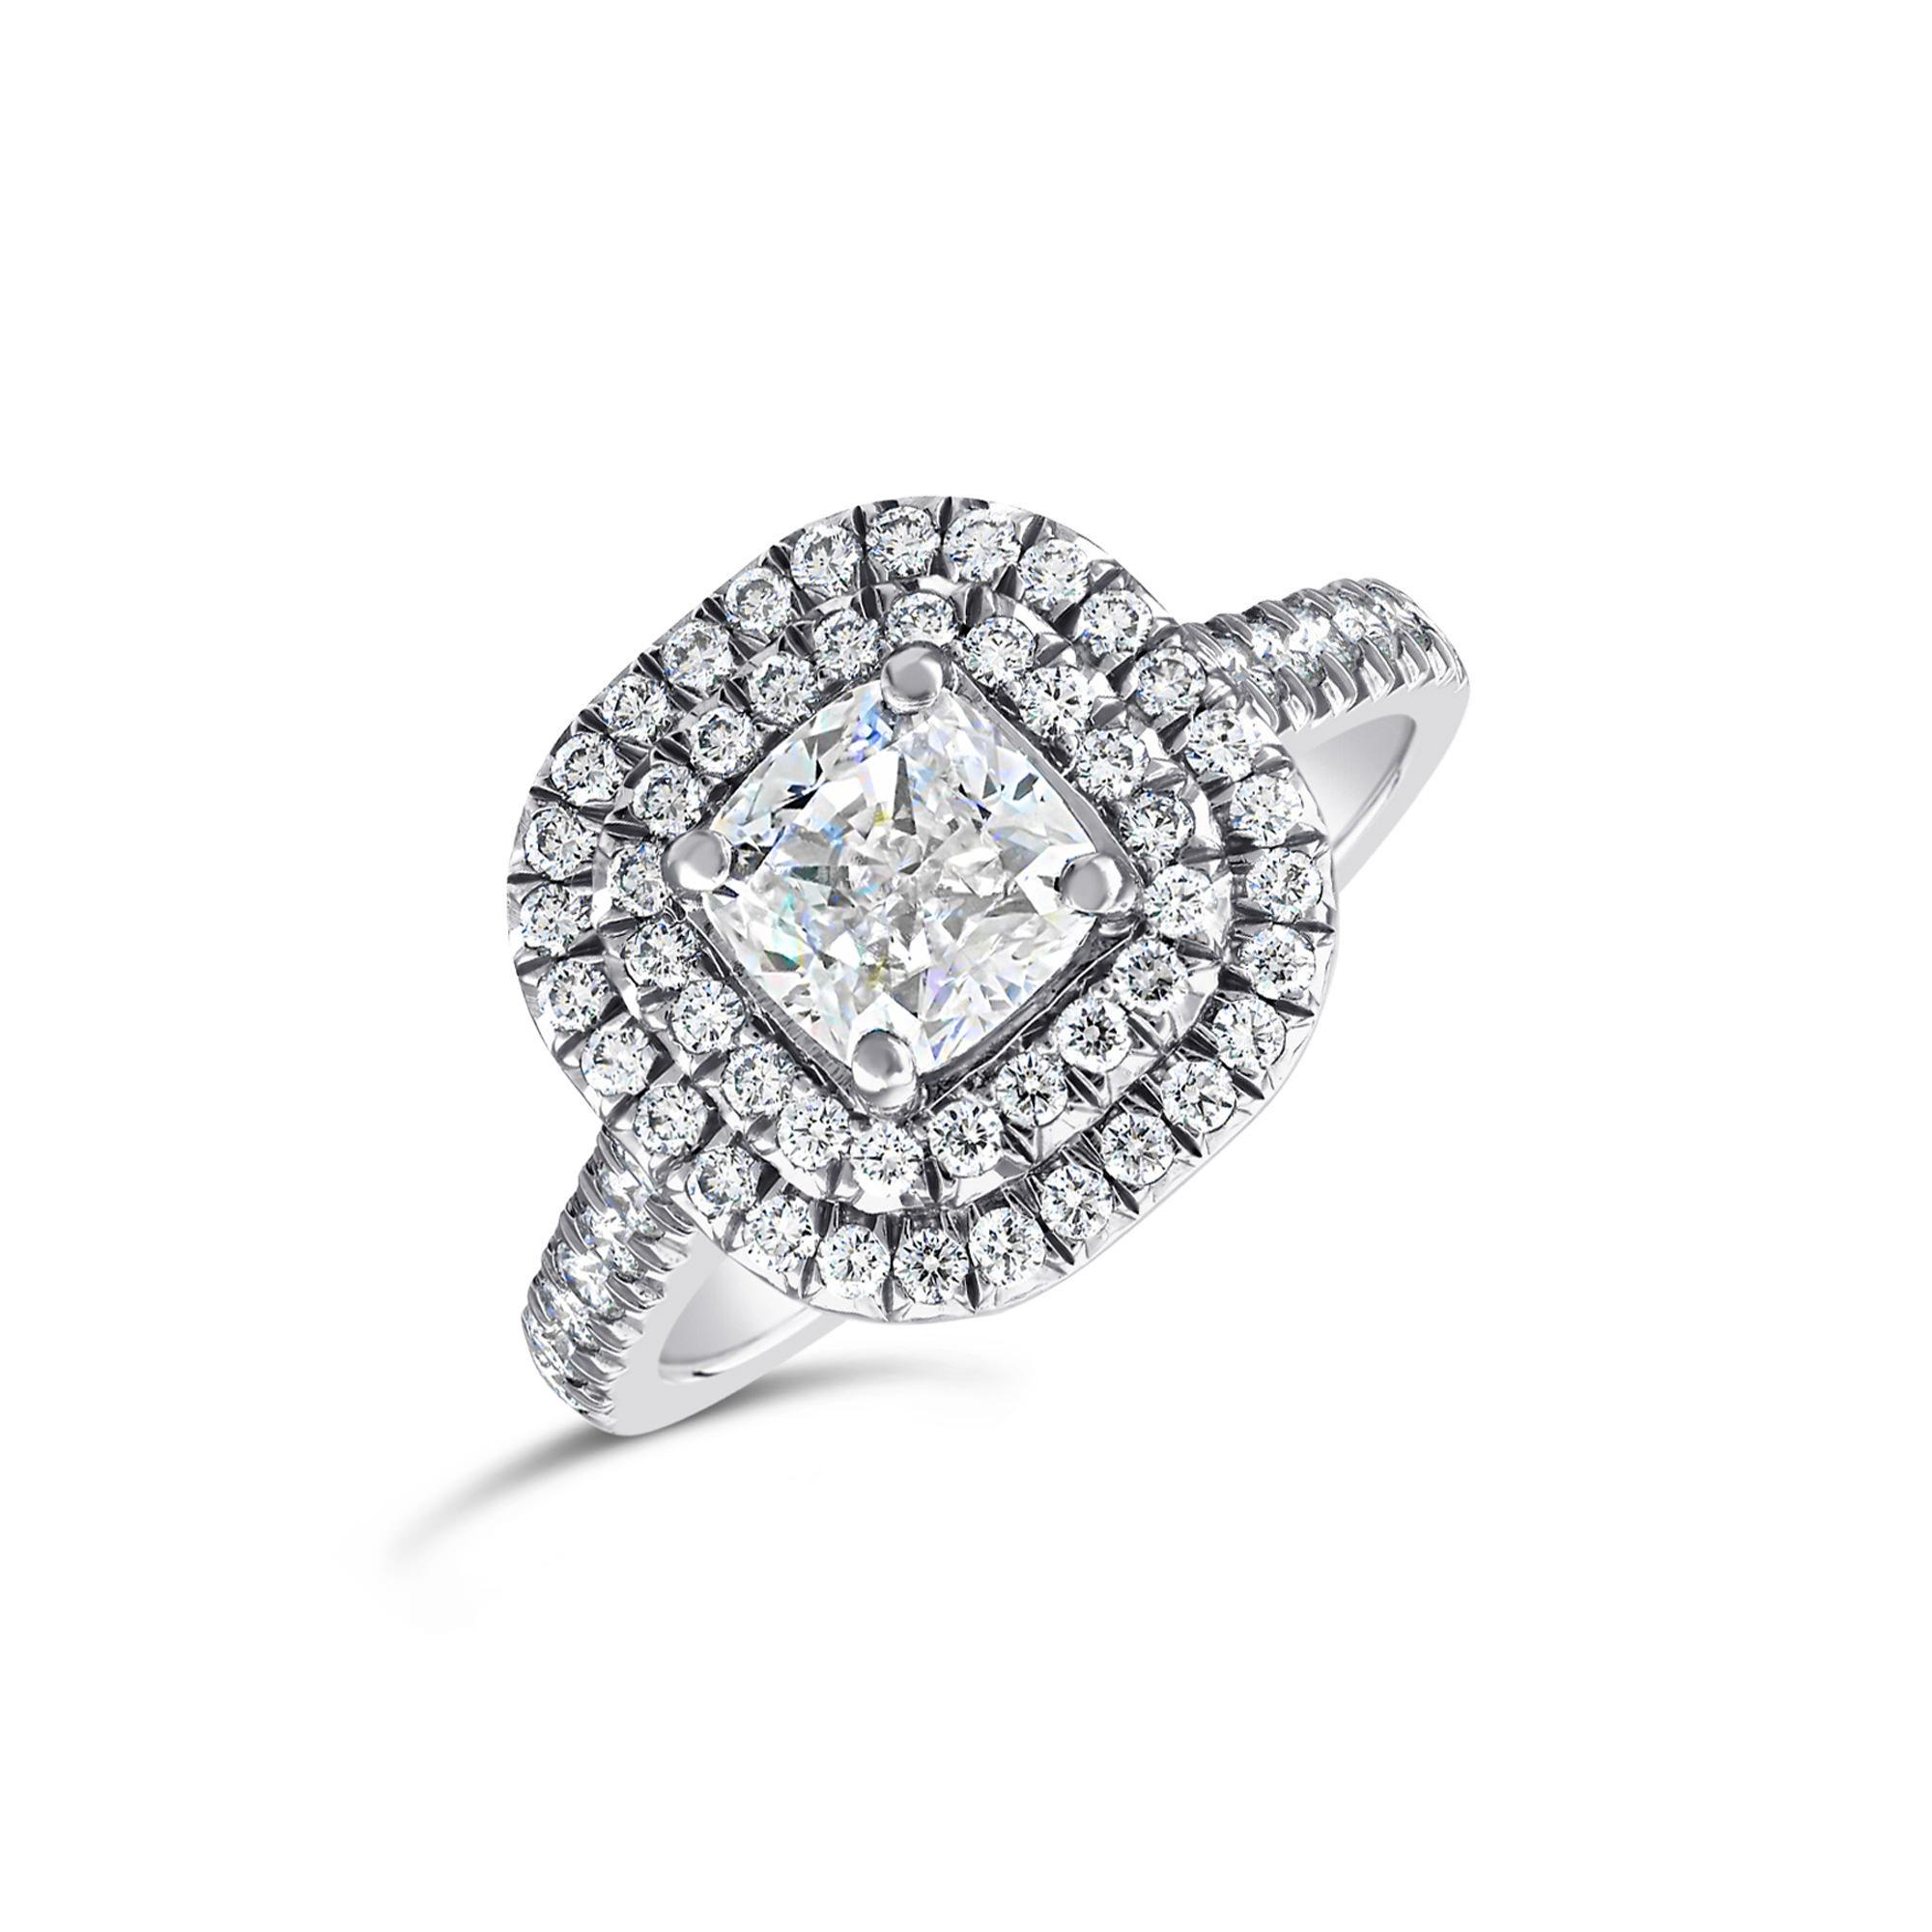 Cushion Cut Platinum Diamond Double Halo Ring